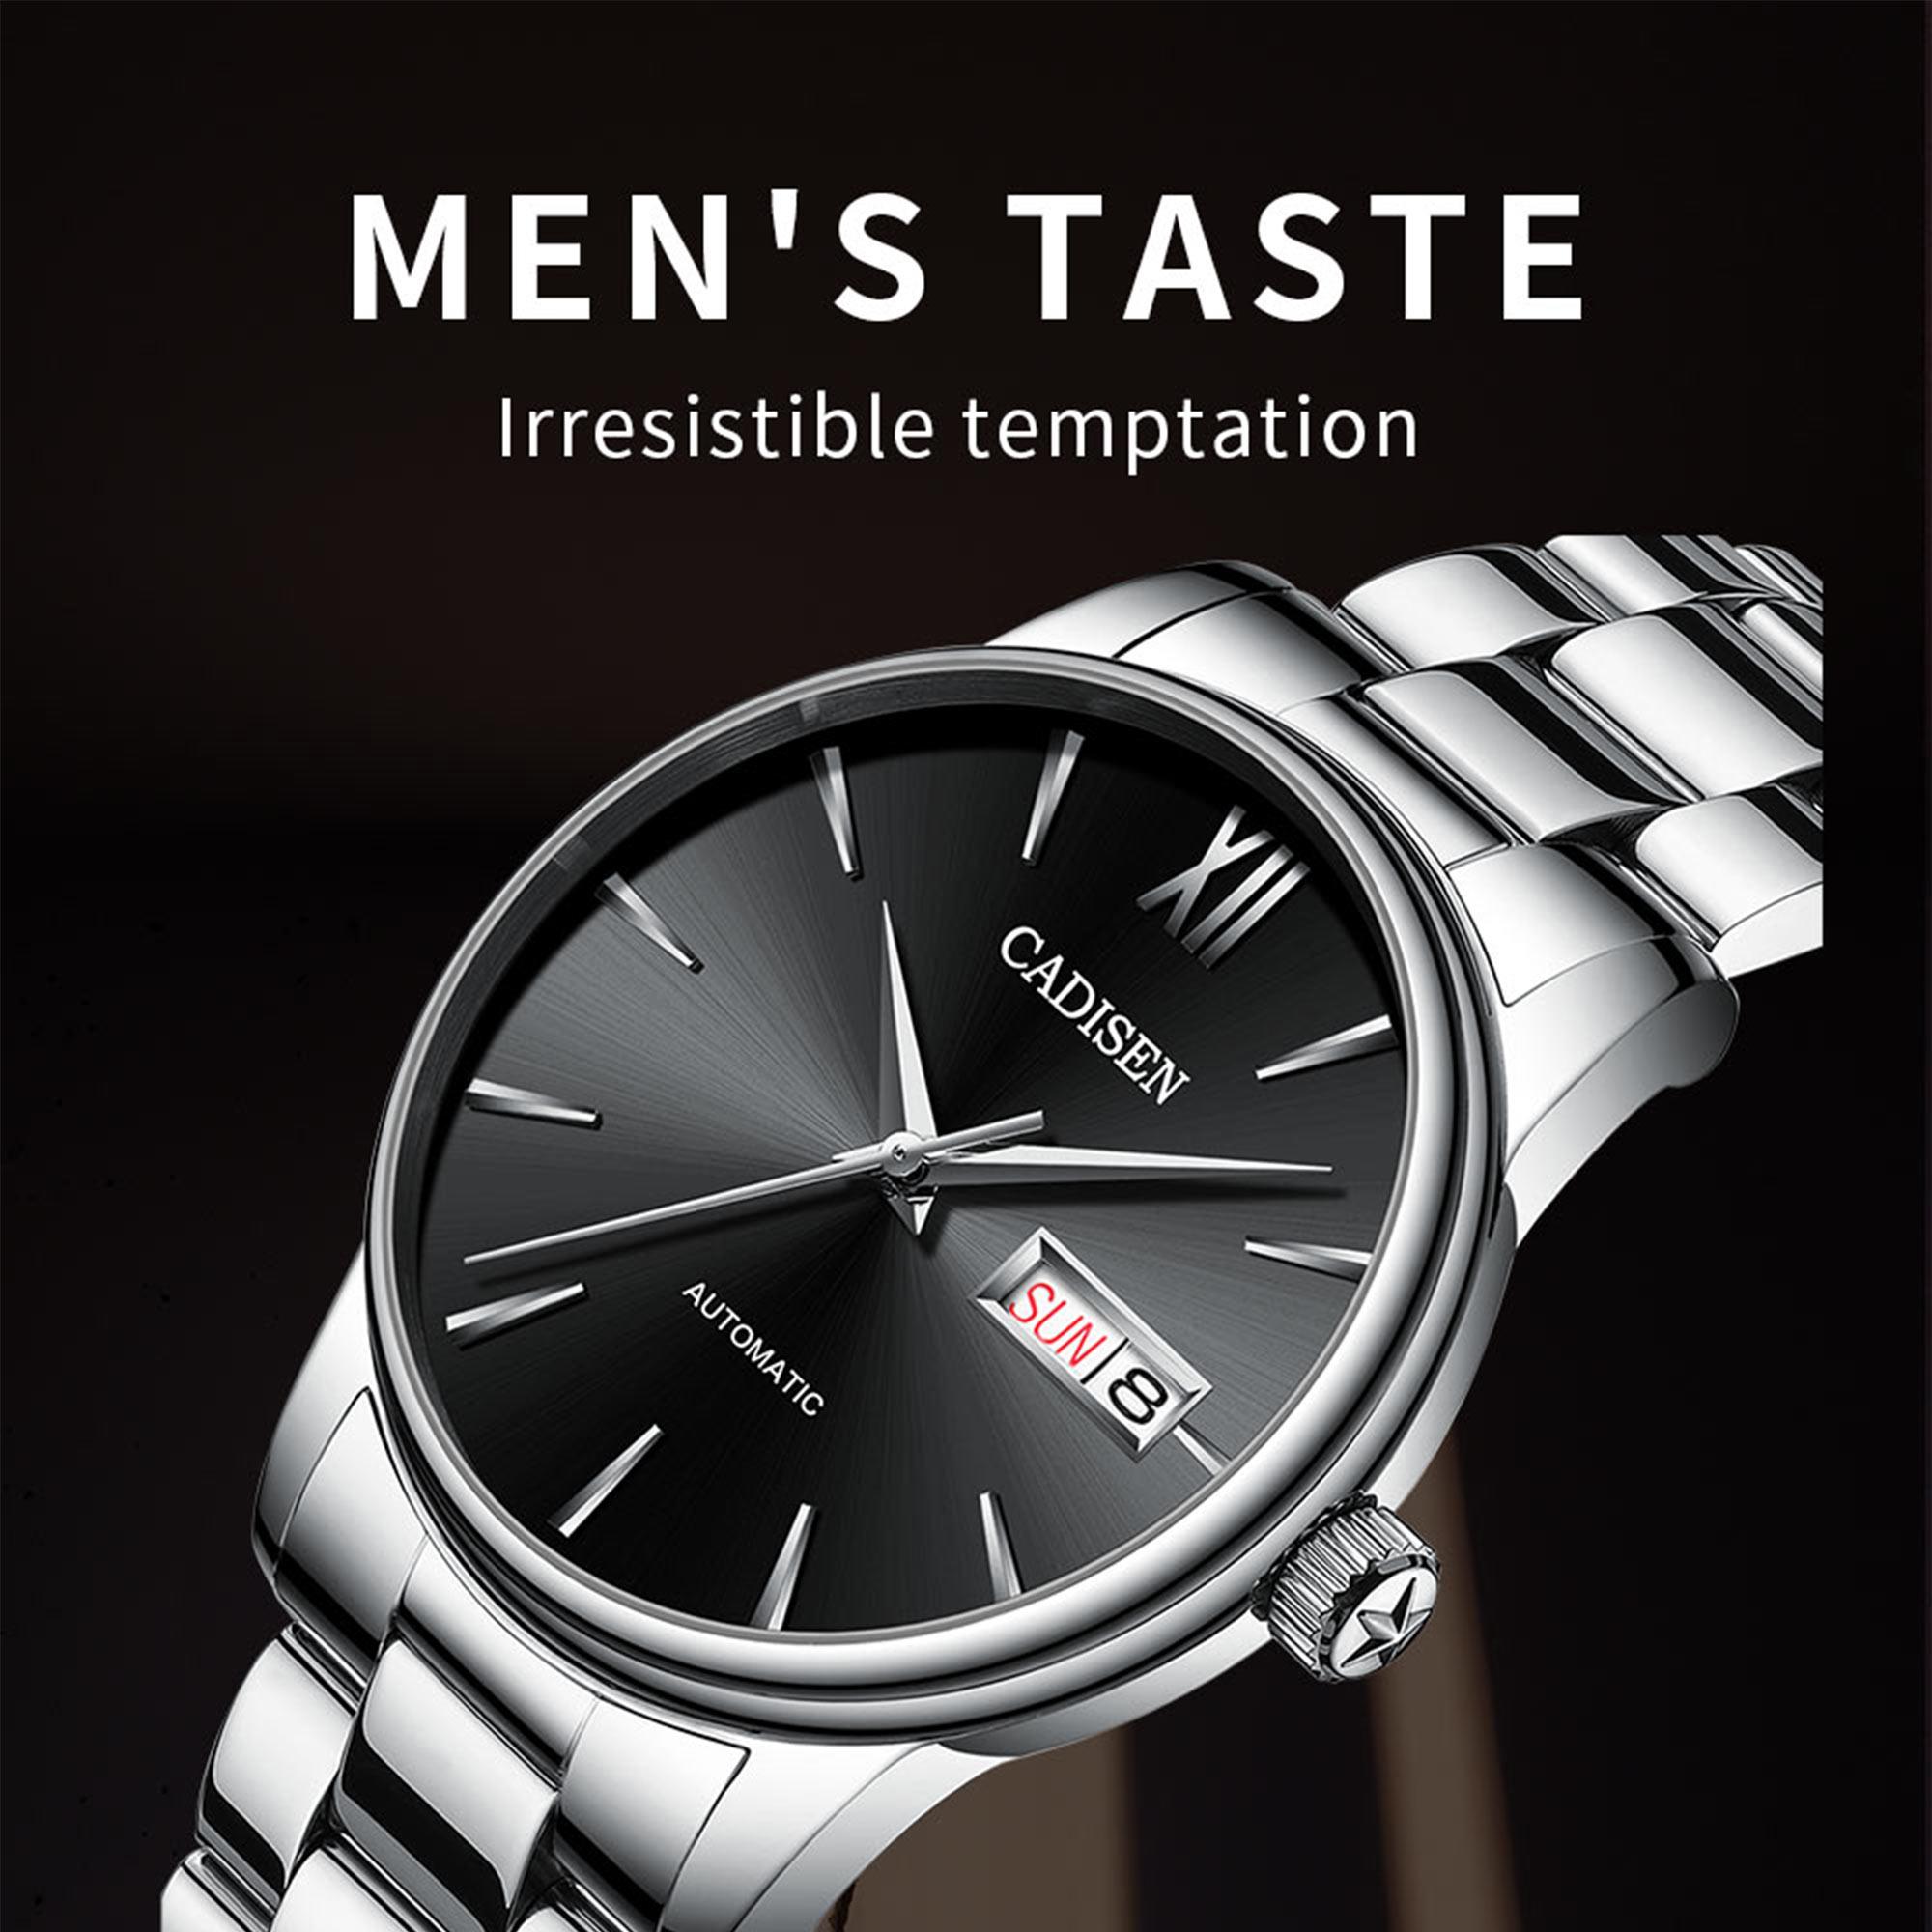 Ha099f5b0737d49b5b07b076acbc6653dh CADISEN Men Watch Automatic Mechanical Watches Role Date Week Top Luxury Brand Japan NH36A Wrist watch Clock Relogio Masculino